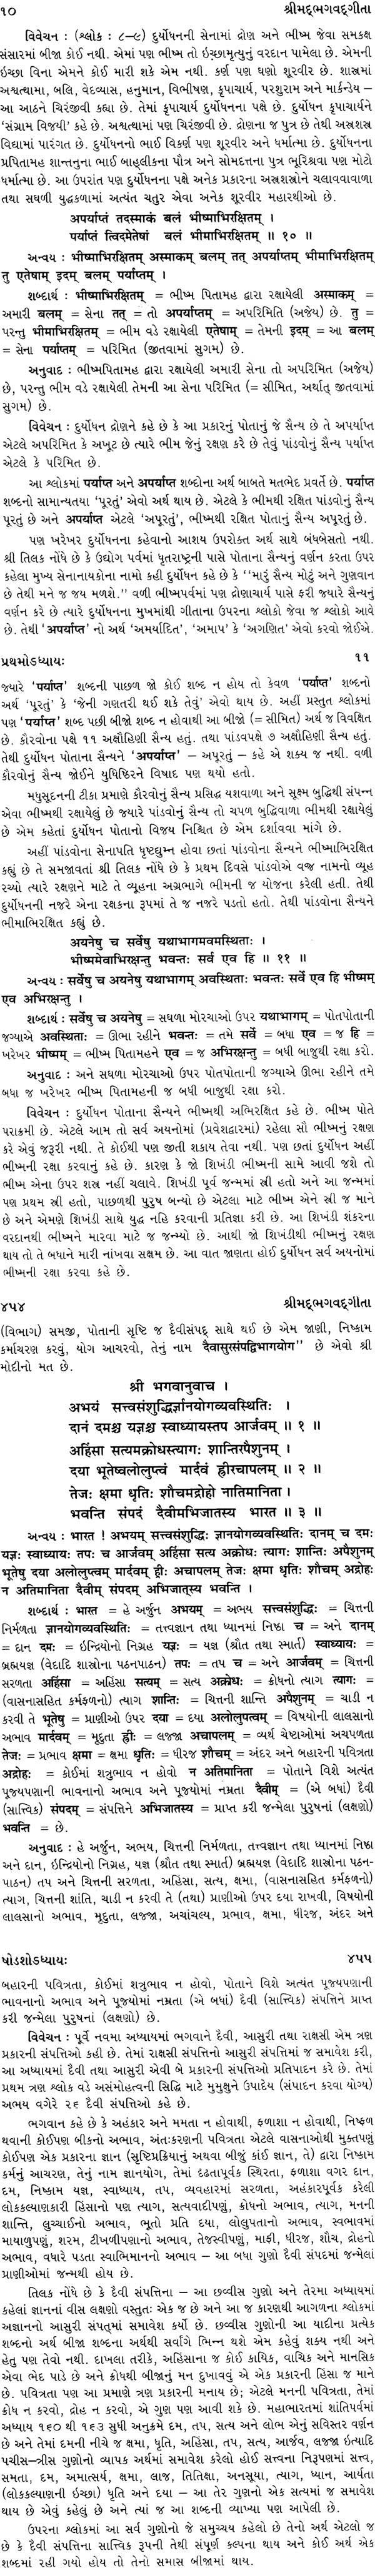 श्रीमद्भगवद्गीता: Srimad Bhagavad Gita (Sanskrit Text With Gujarati  Translation)